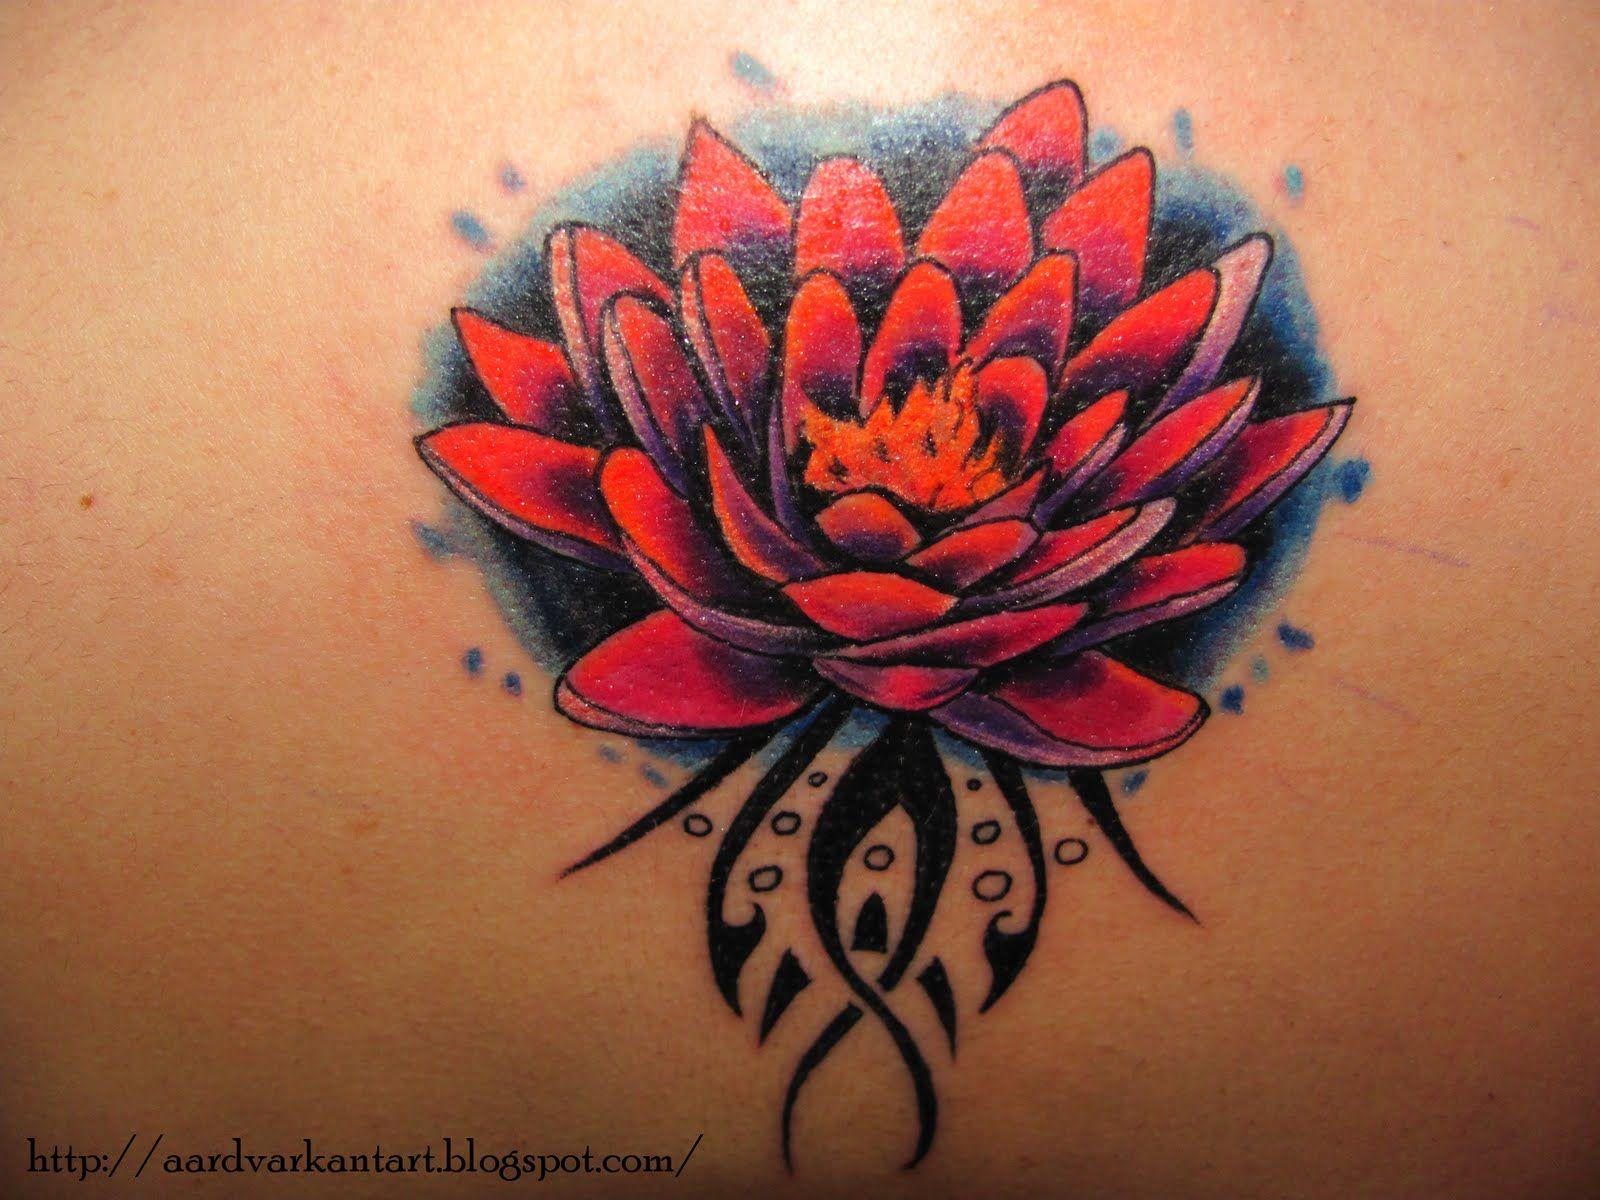 Tattoos Tribal Red Lotus Flower Tattoos Designs Tattoos Inspiration And Men Flower Tattoo Lotus Tattoo Design Flower Cover Up Tattoos